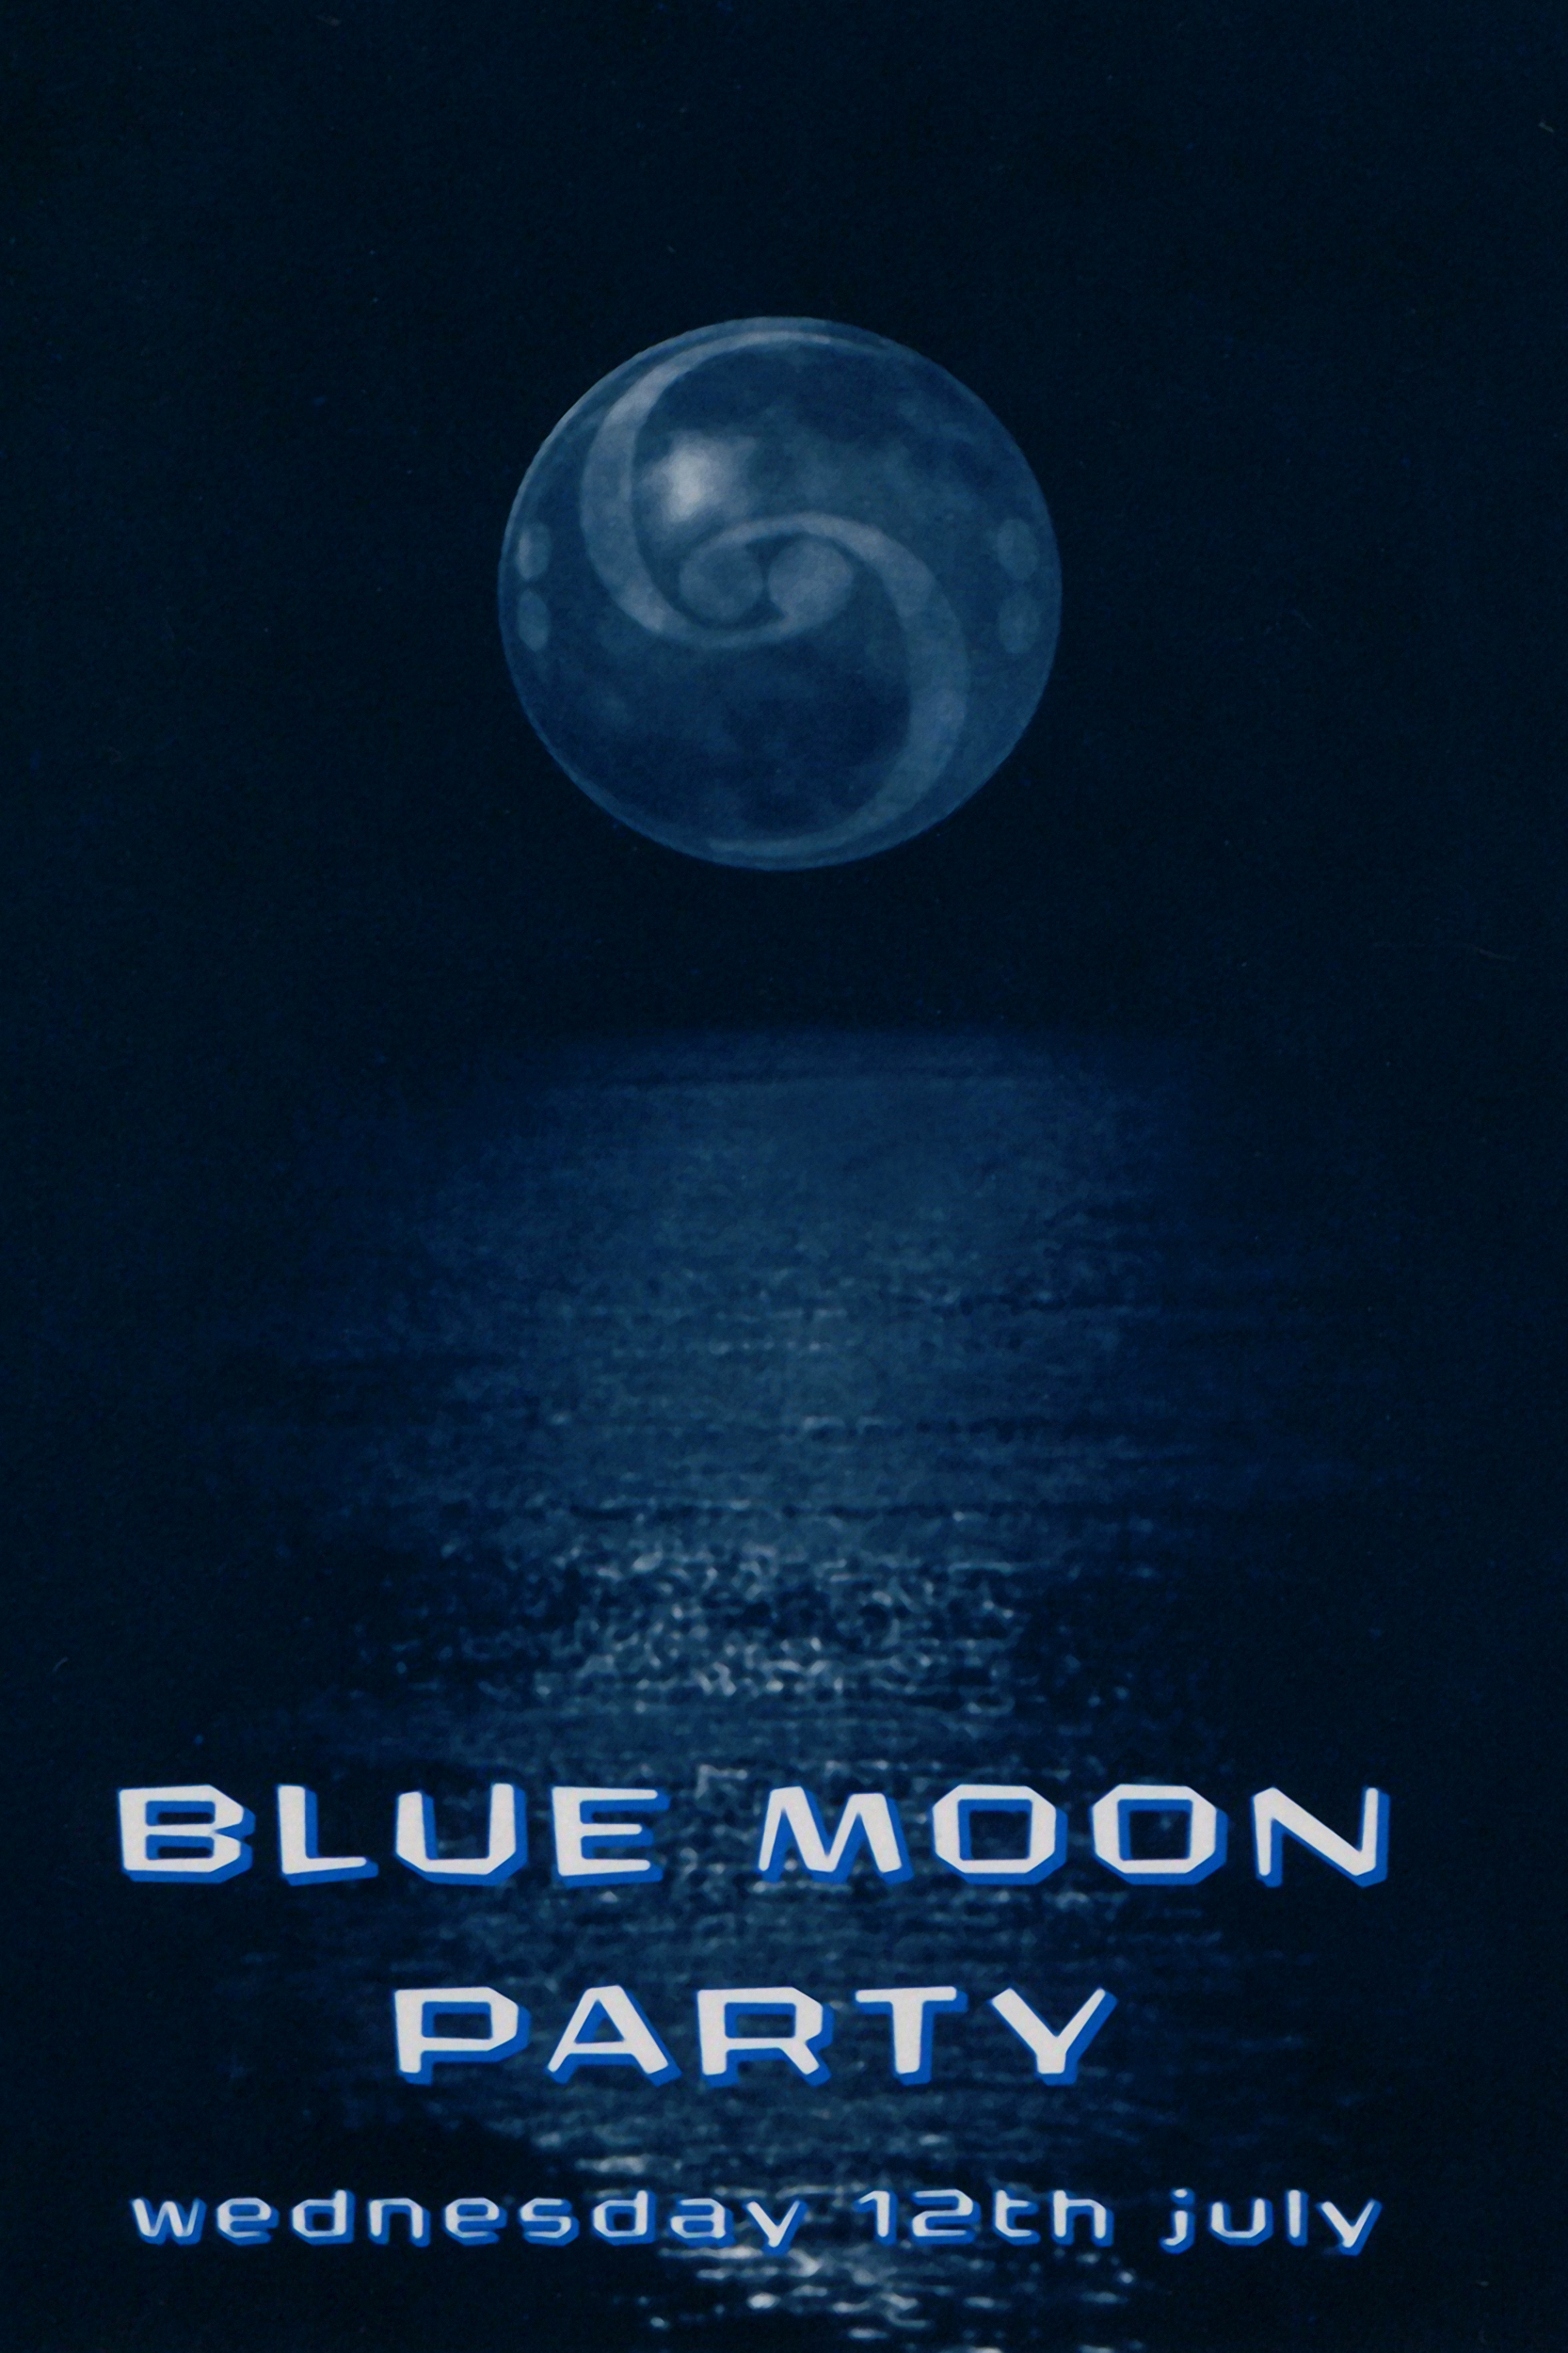 Blue Moon Party flyer 200.jpg